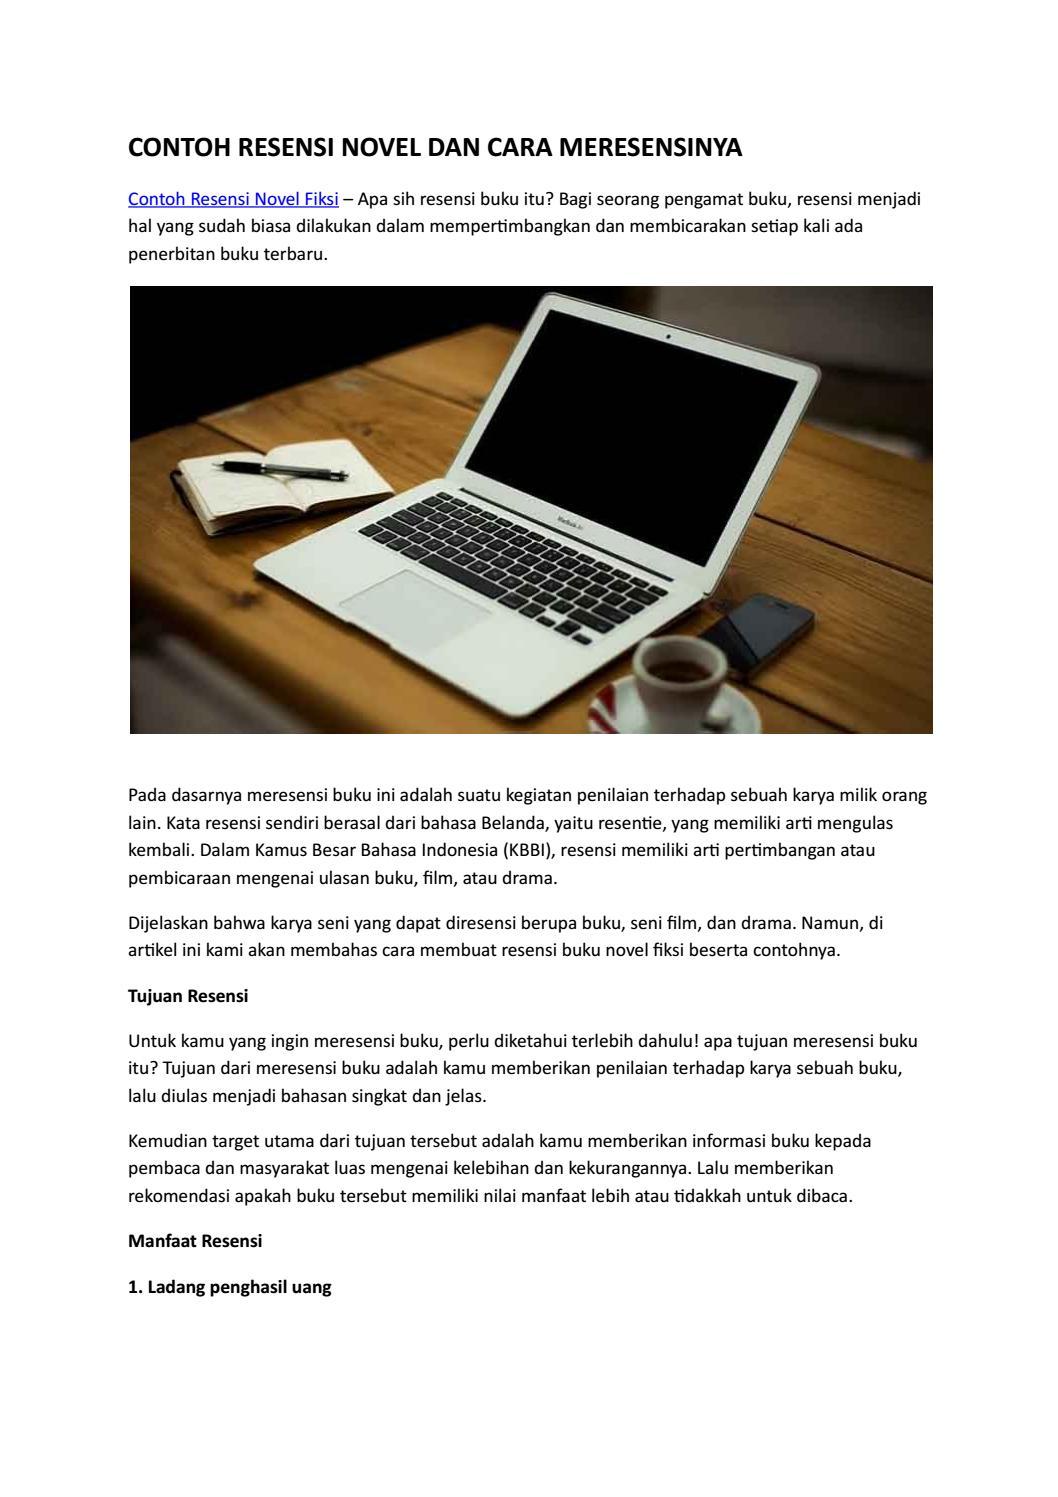 Summary 15 Contoh Resensi Novel Fiksi Lengkap Beserta Cara Meresensi